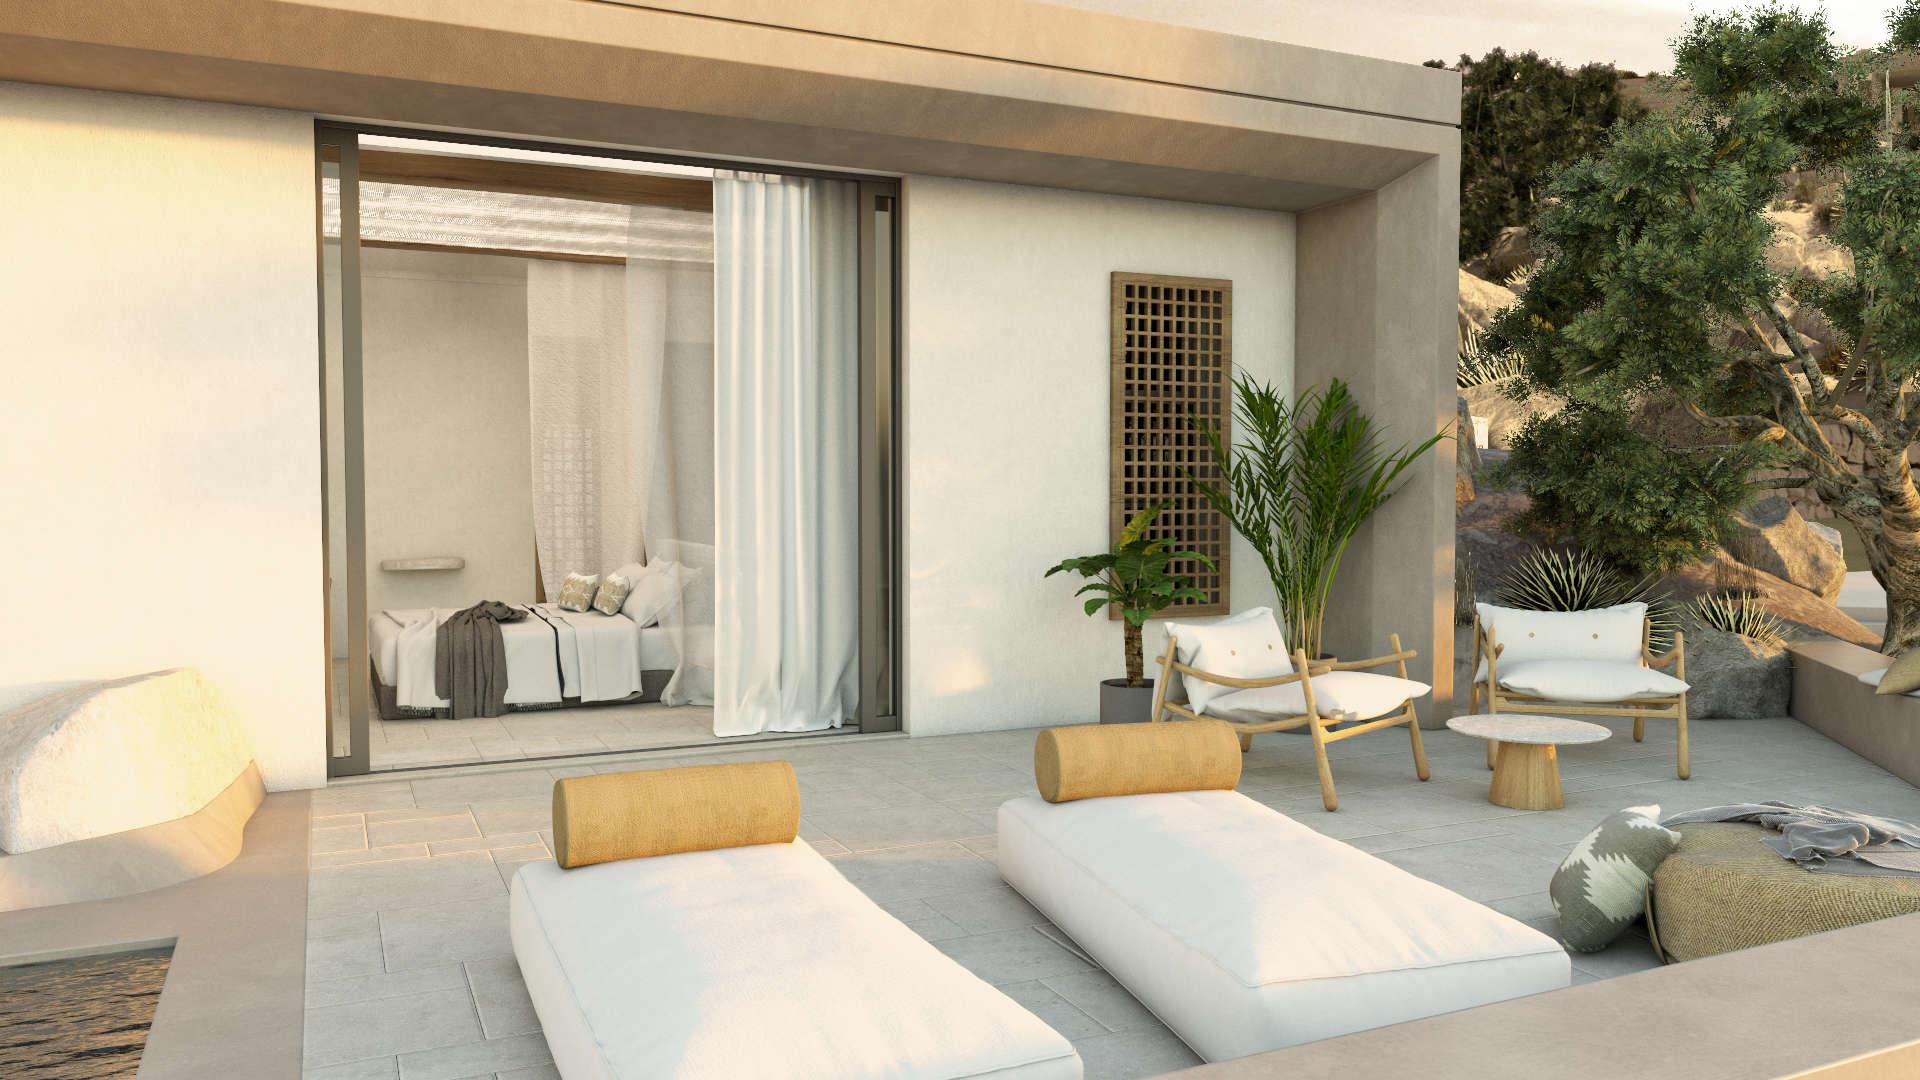 Luxury suite, exterior design, private poolside. Πολυτελής σουίτα. Εξωτερικός χώρος με ιδιωτική πισίνα.